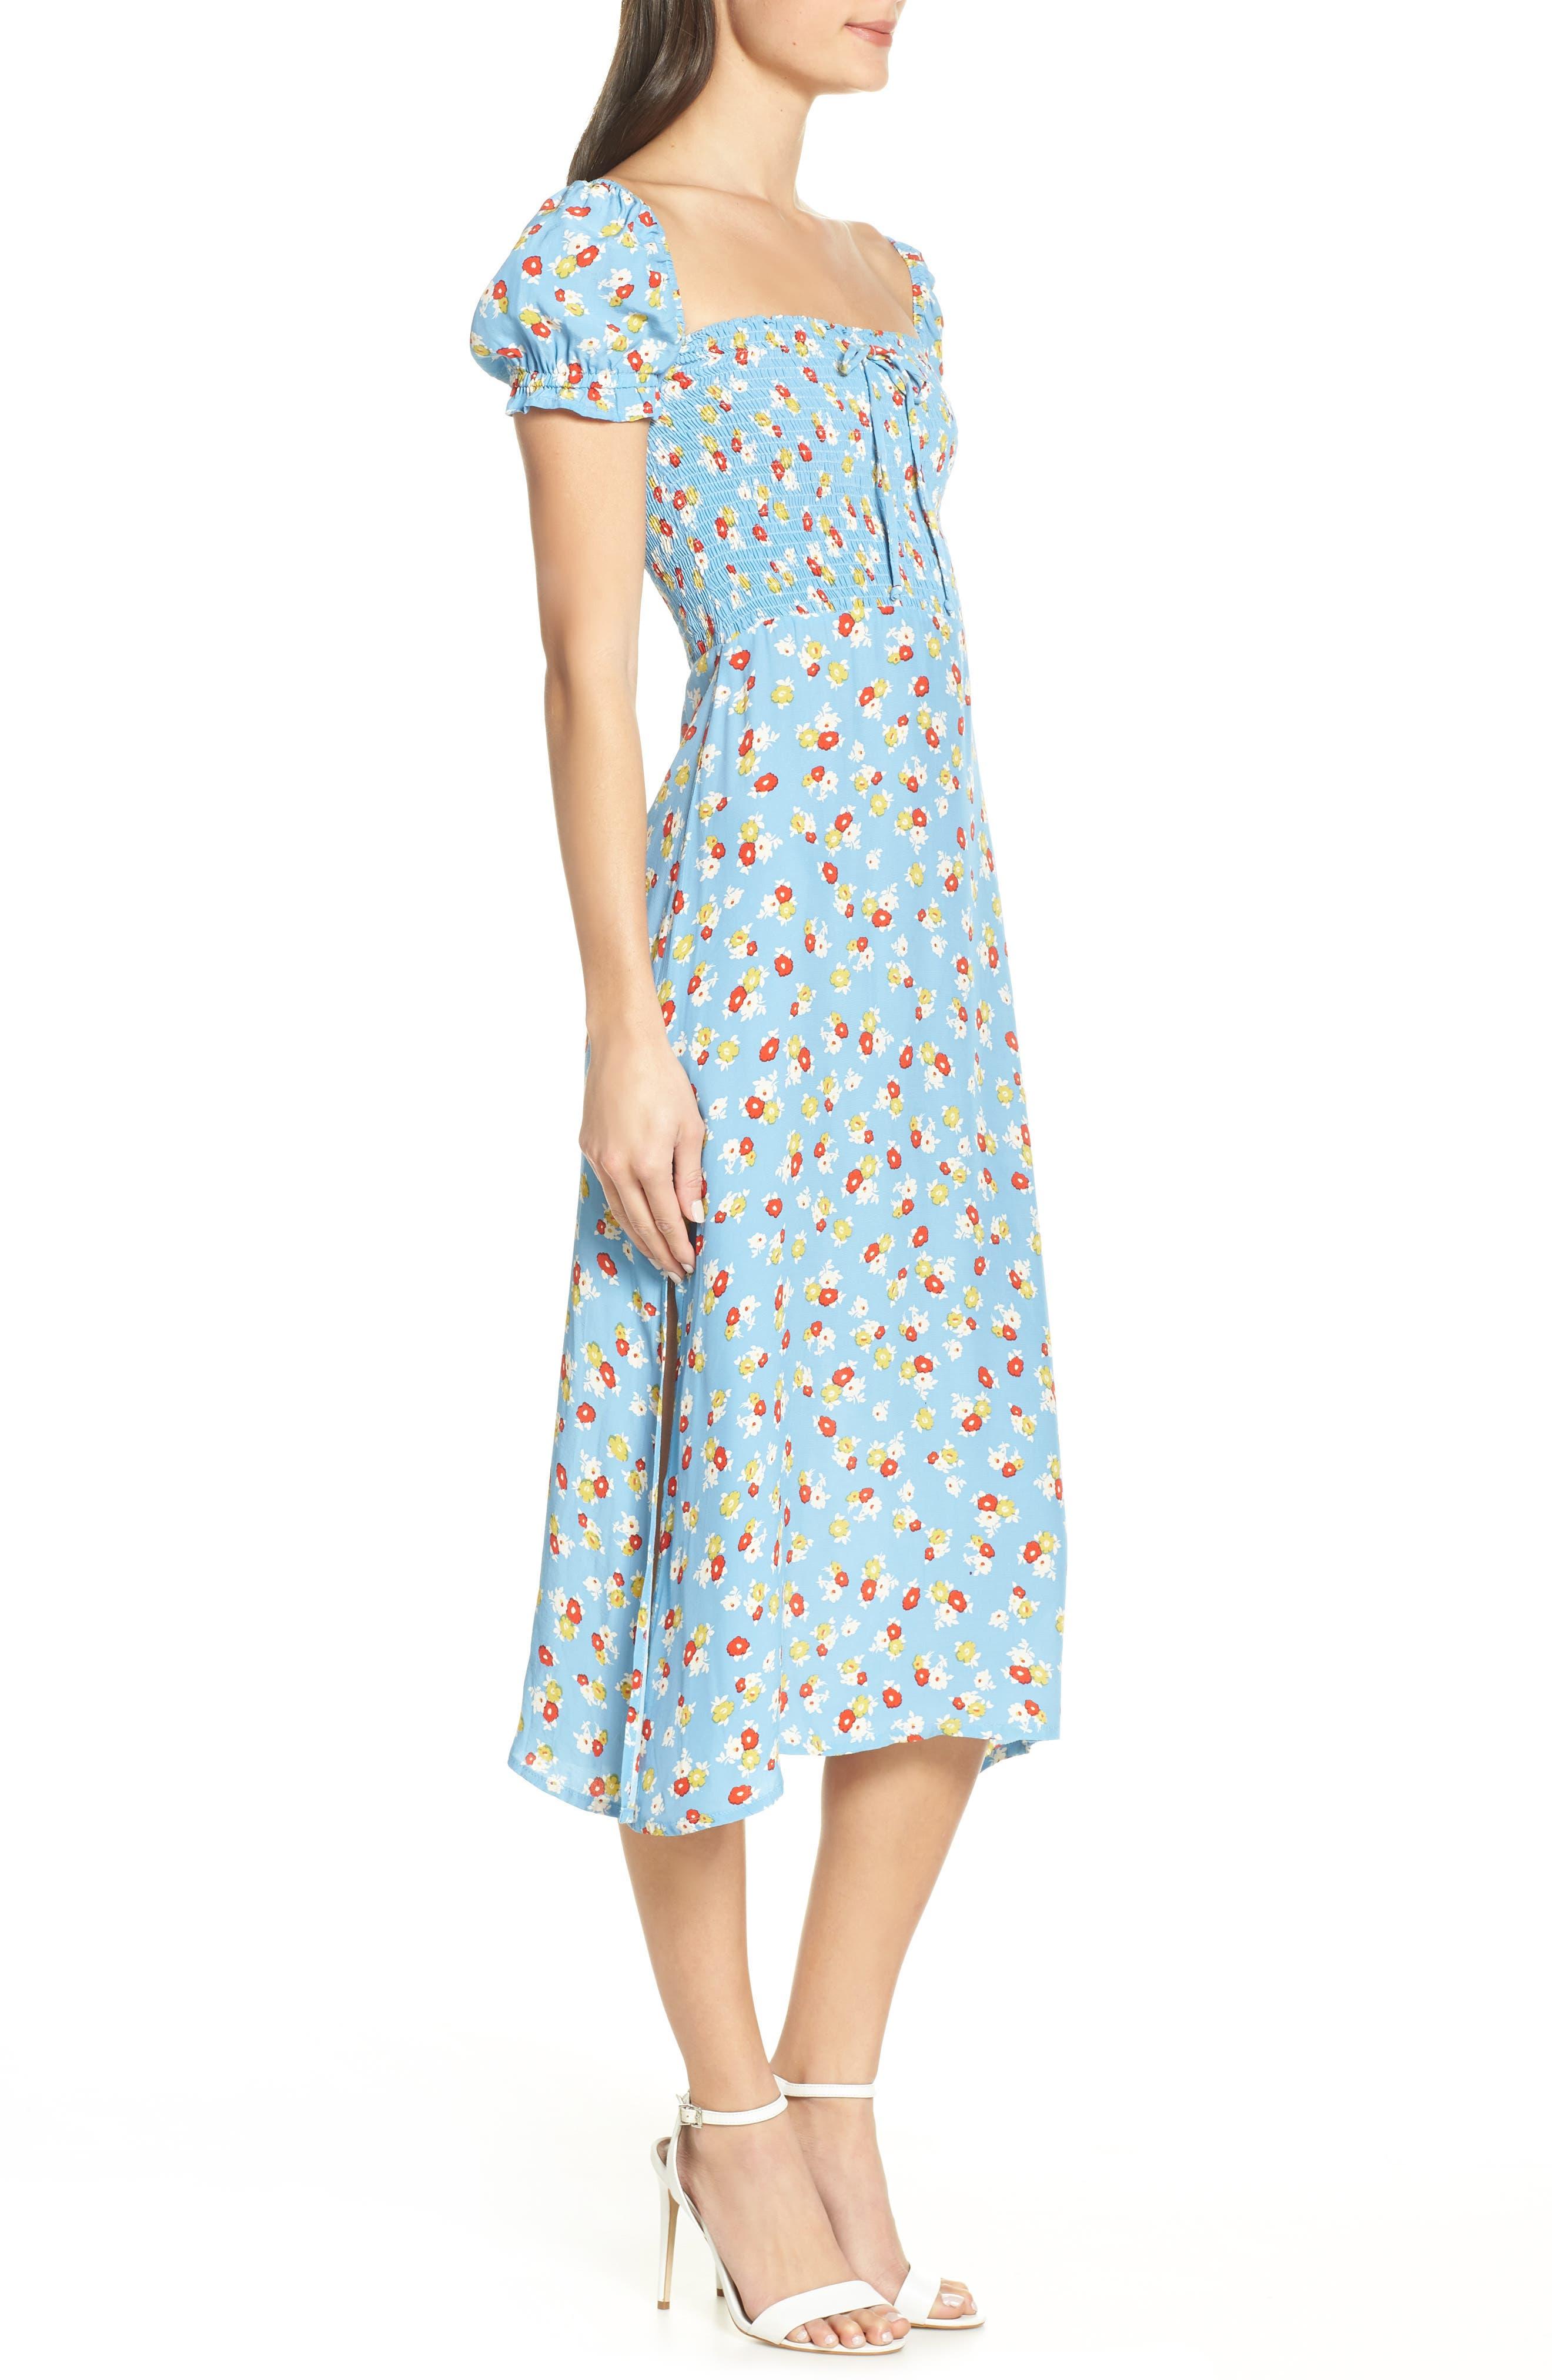 FAITHFULL THE BRAND, Castilo Jasmin Midi Dress, Alternate thumbnail 3, color, JASMIN FLORAL PRINT - BLUE